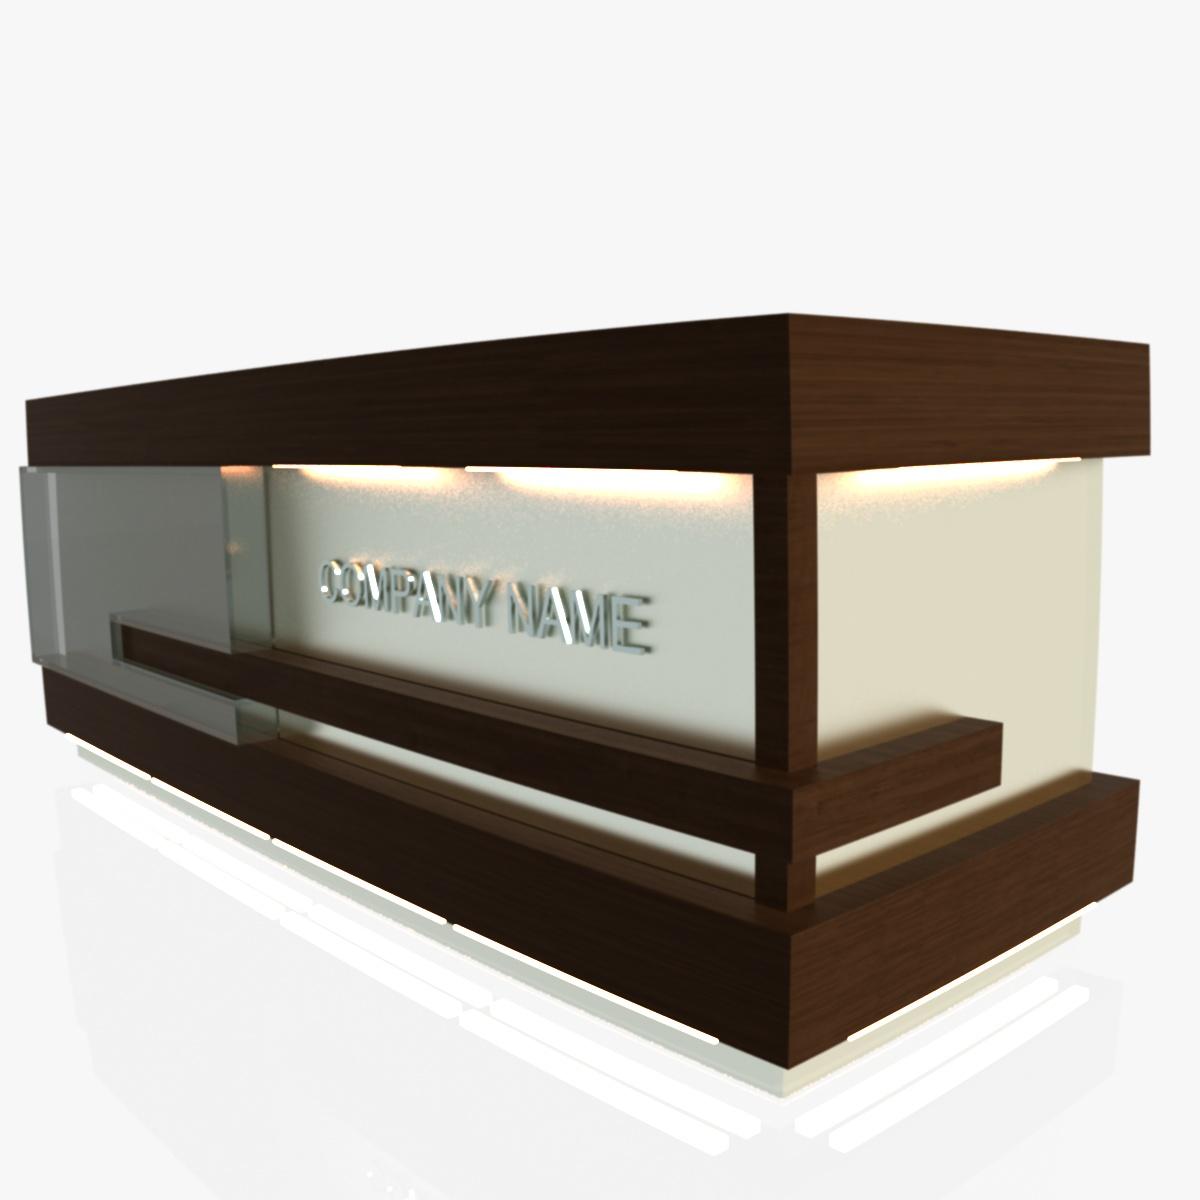 reception desk 1 3d model 3ds max dxf fbx  obj 219848